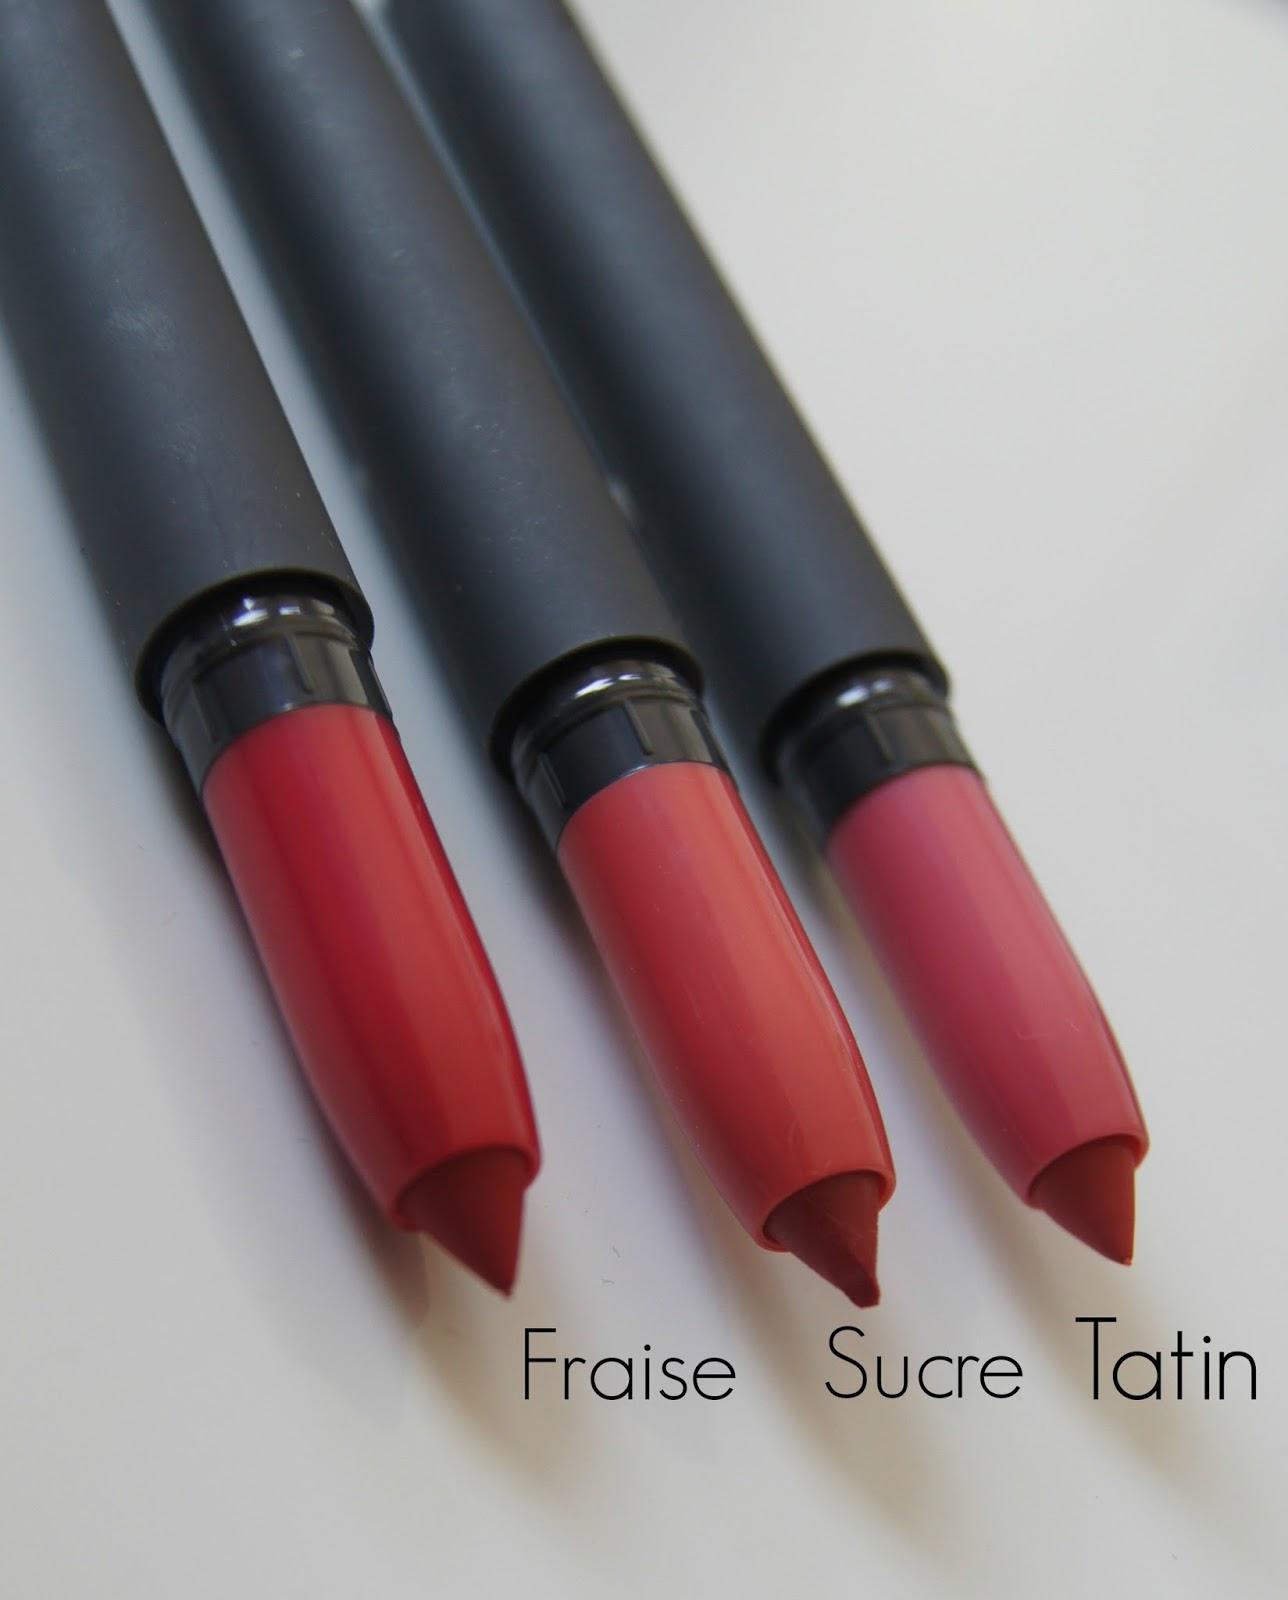 Bite Matte Creme Lip Crayon-Fraise, Sucre and Tatin